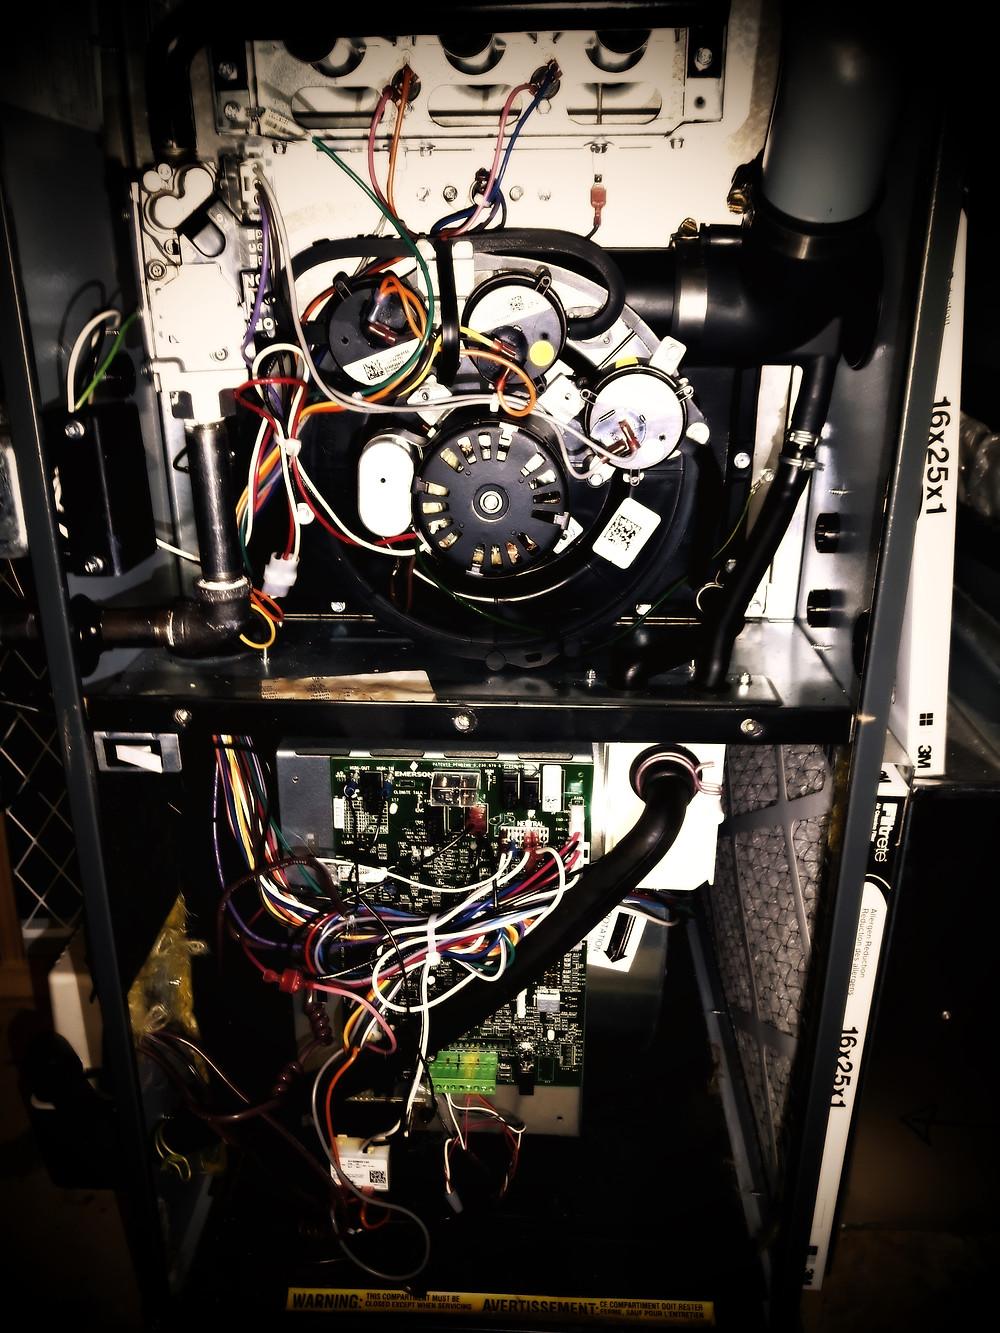 Heating maintenance - Cardinal & Keys Home Inspections